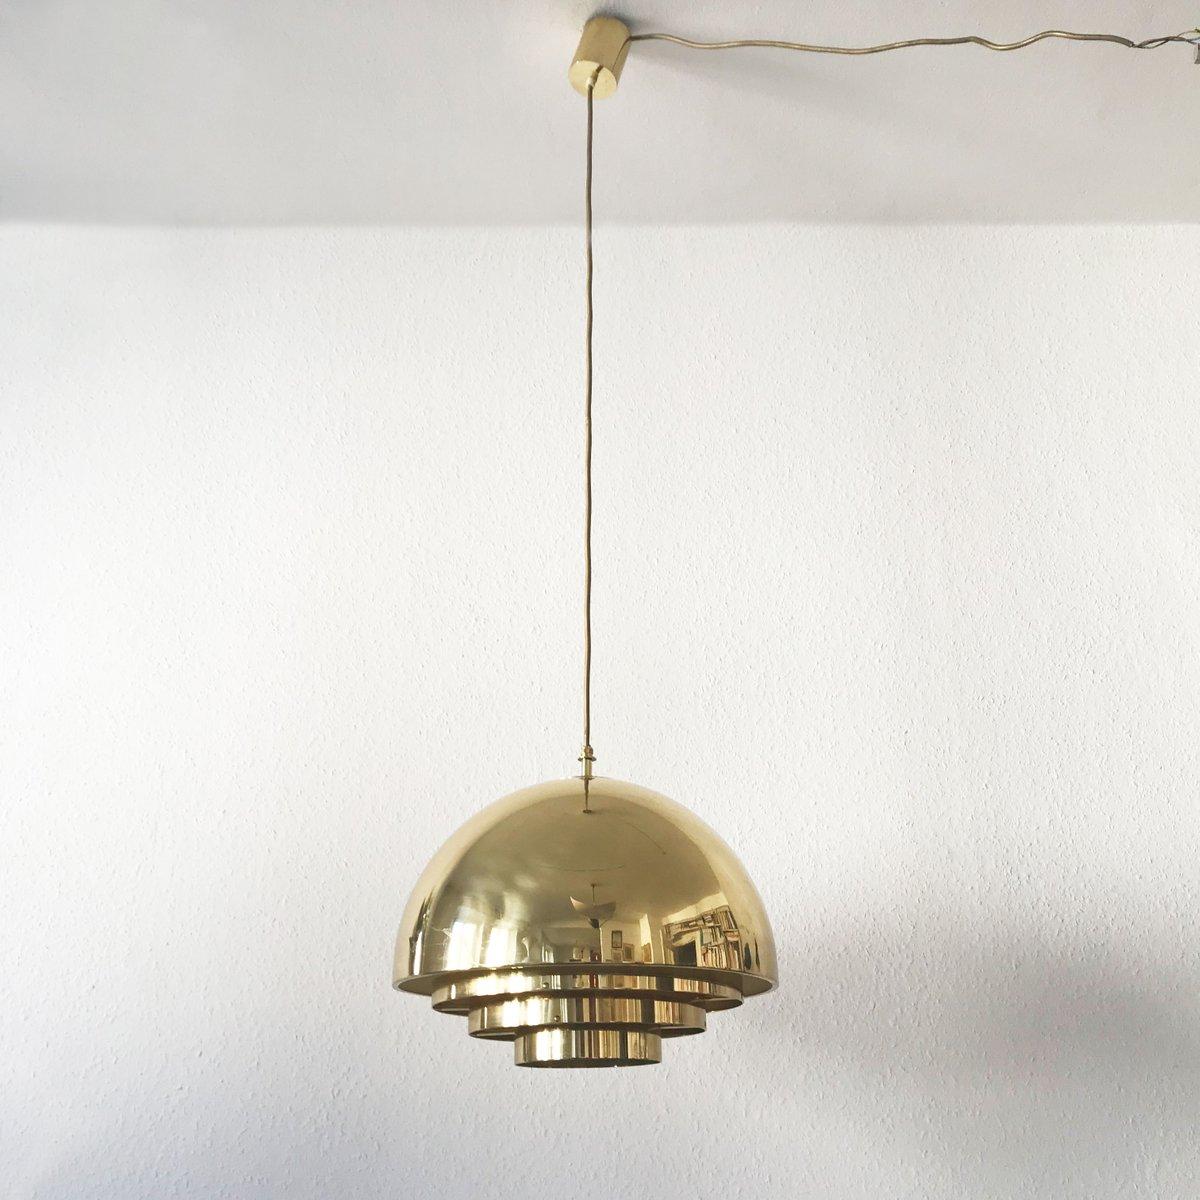 Mid century modern brass dome pendant lamp from vereinigte mid century modern brass dome pendant lamp from vereinigte werksttten for sale at pamono aloadofball Gallery